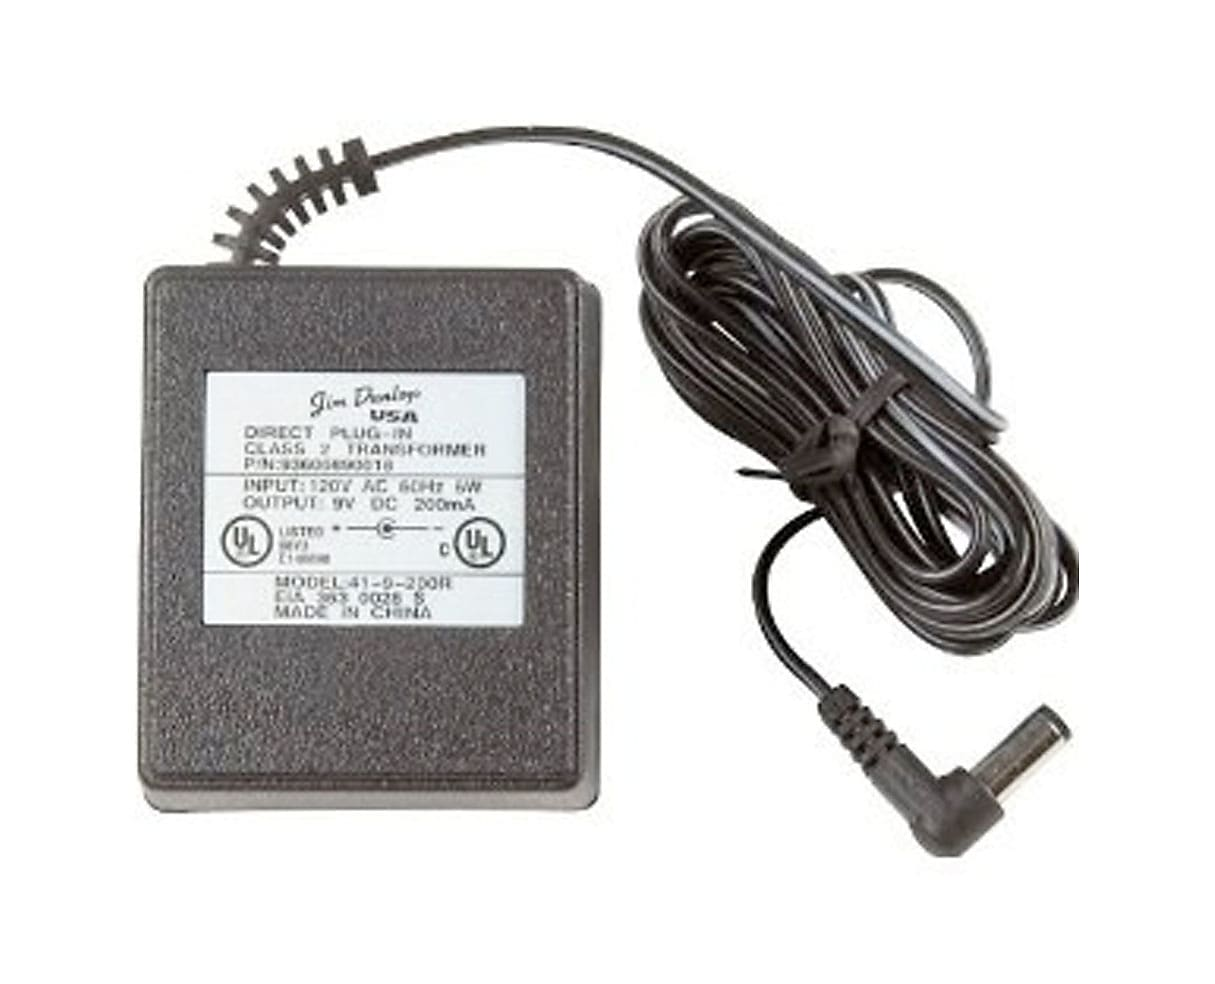 Dunlop ECB003US 9v AC Power Supply Adapter   Reverb